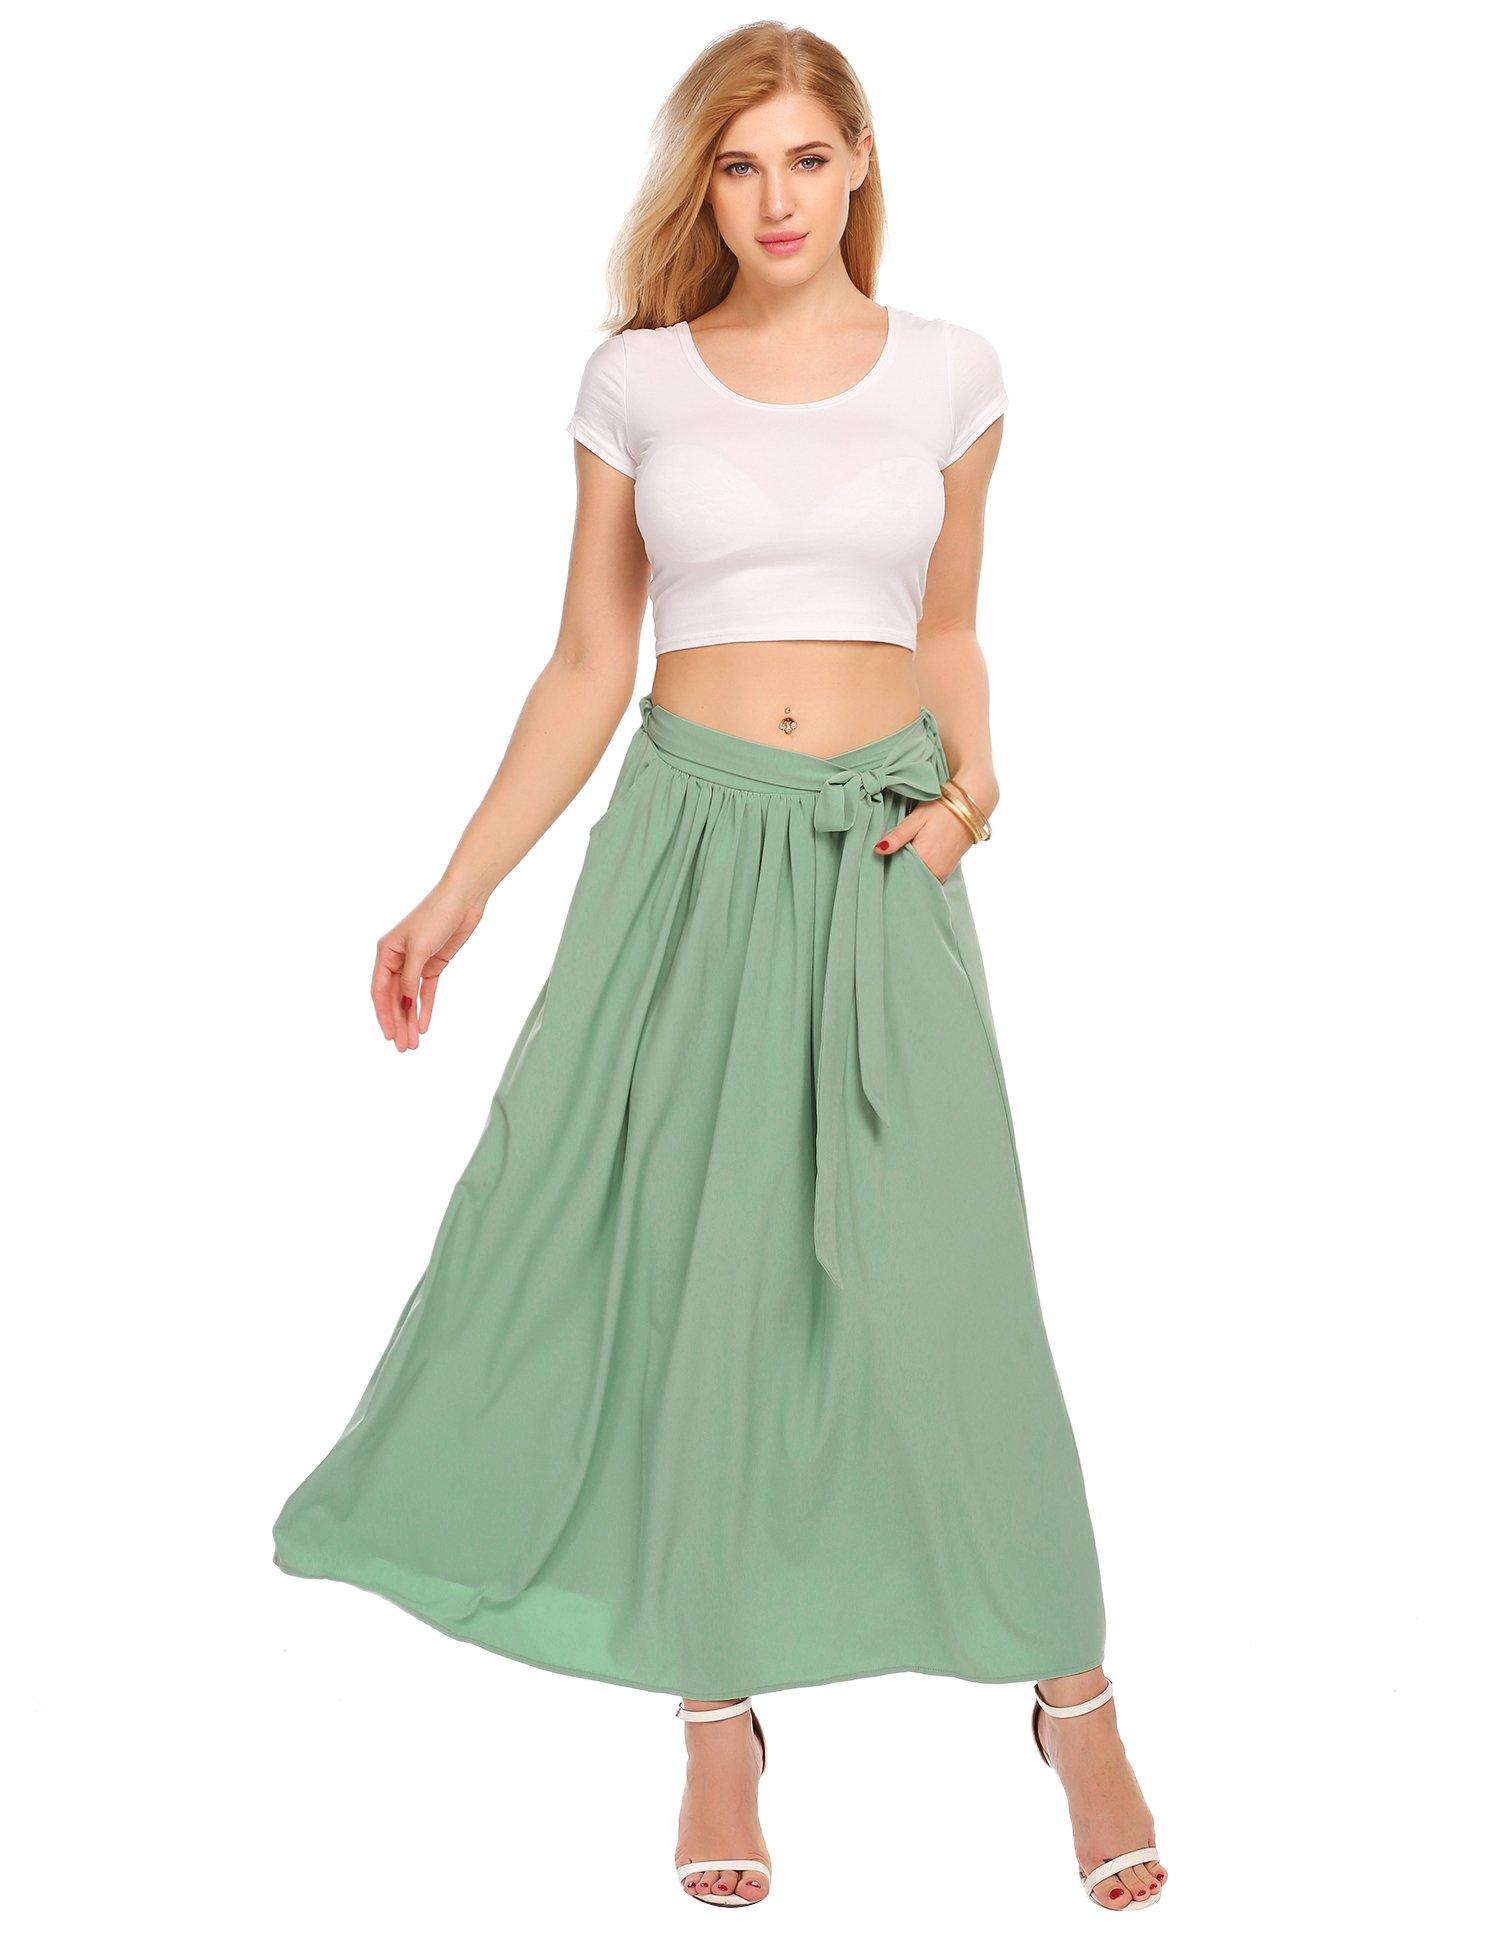 Zeagoo Women's High Waist Flared A-line Pleated Midi Long Skirt with Pocket S-XL